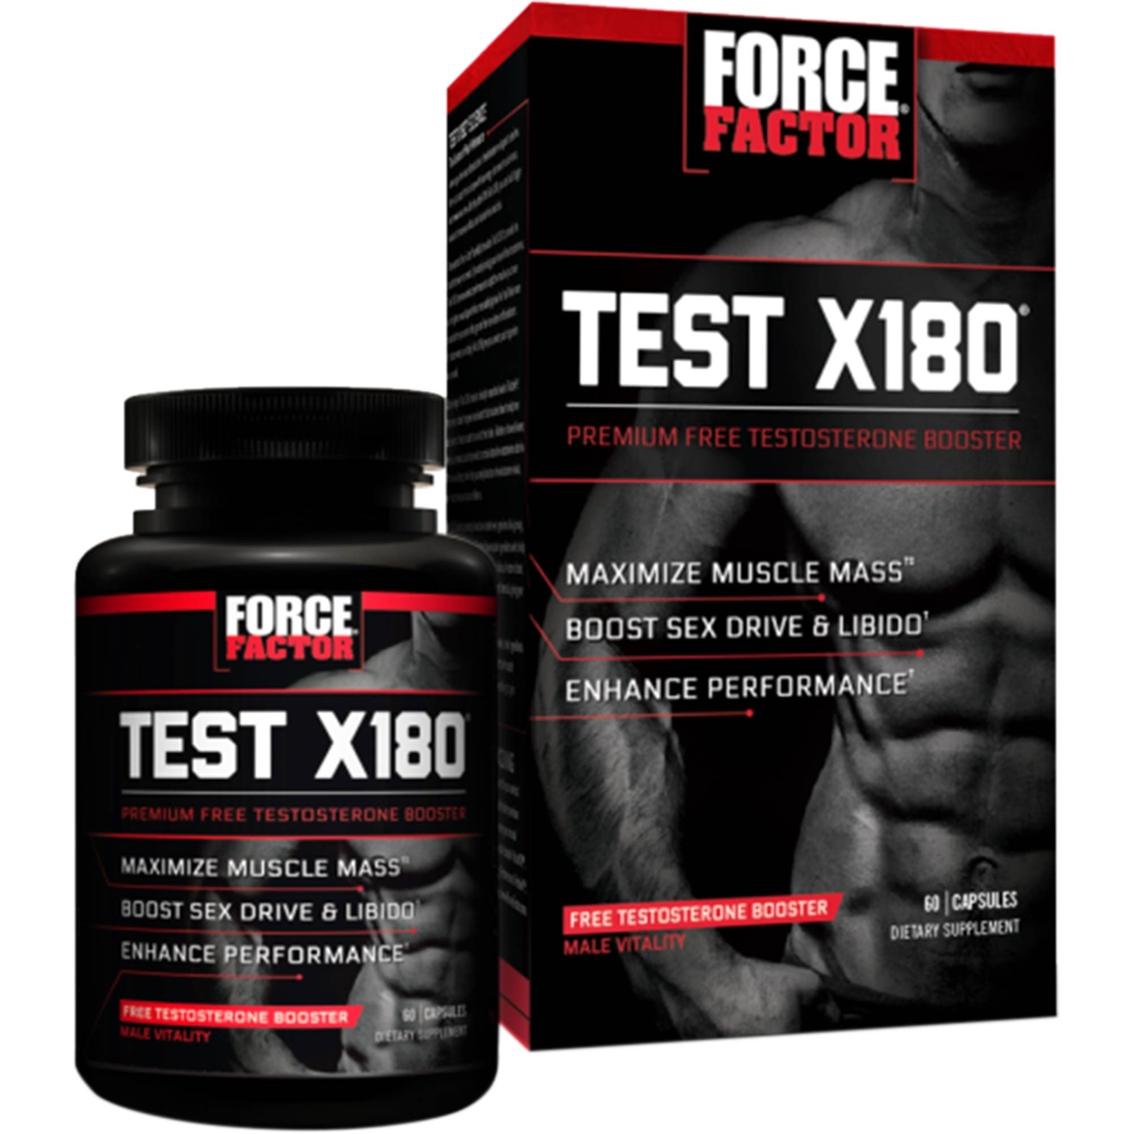 Force Factor Test X180 Sports Nutrition Supplement 60 Pk.